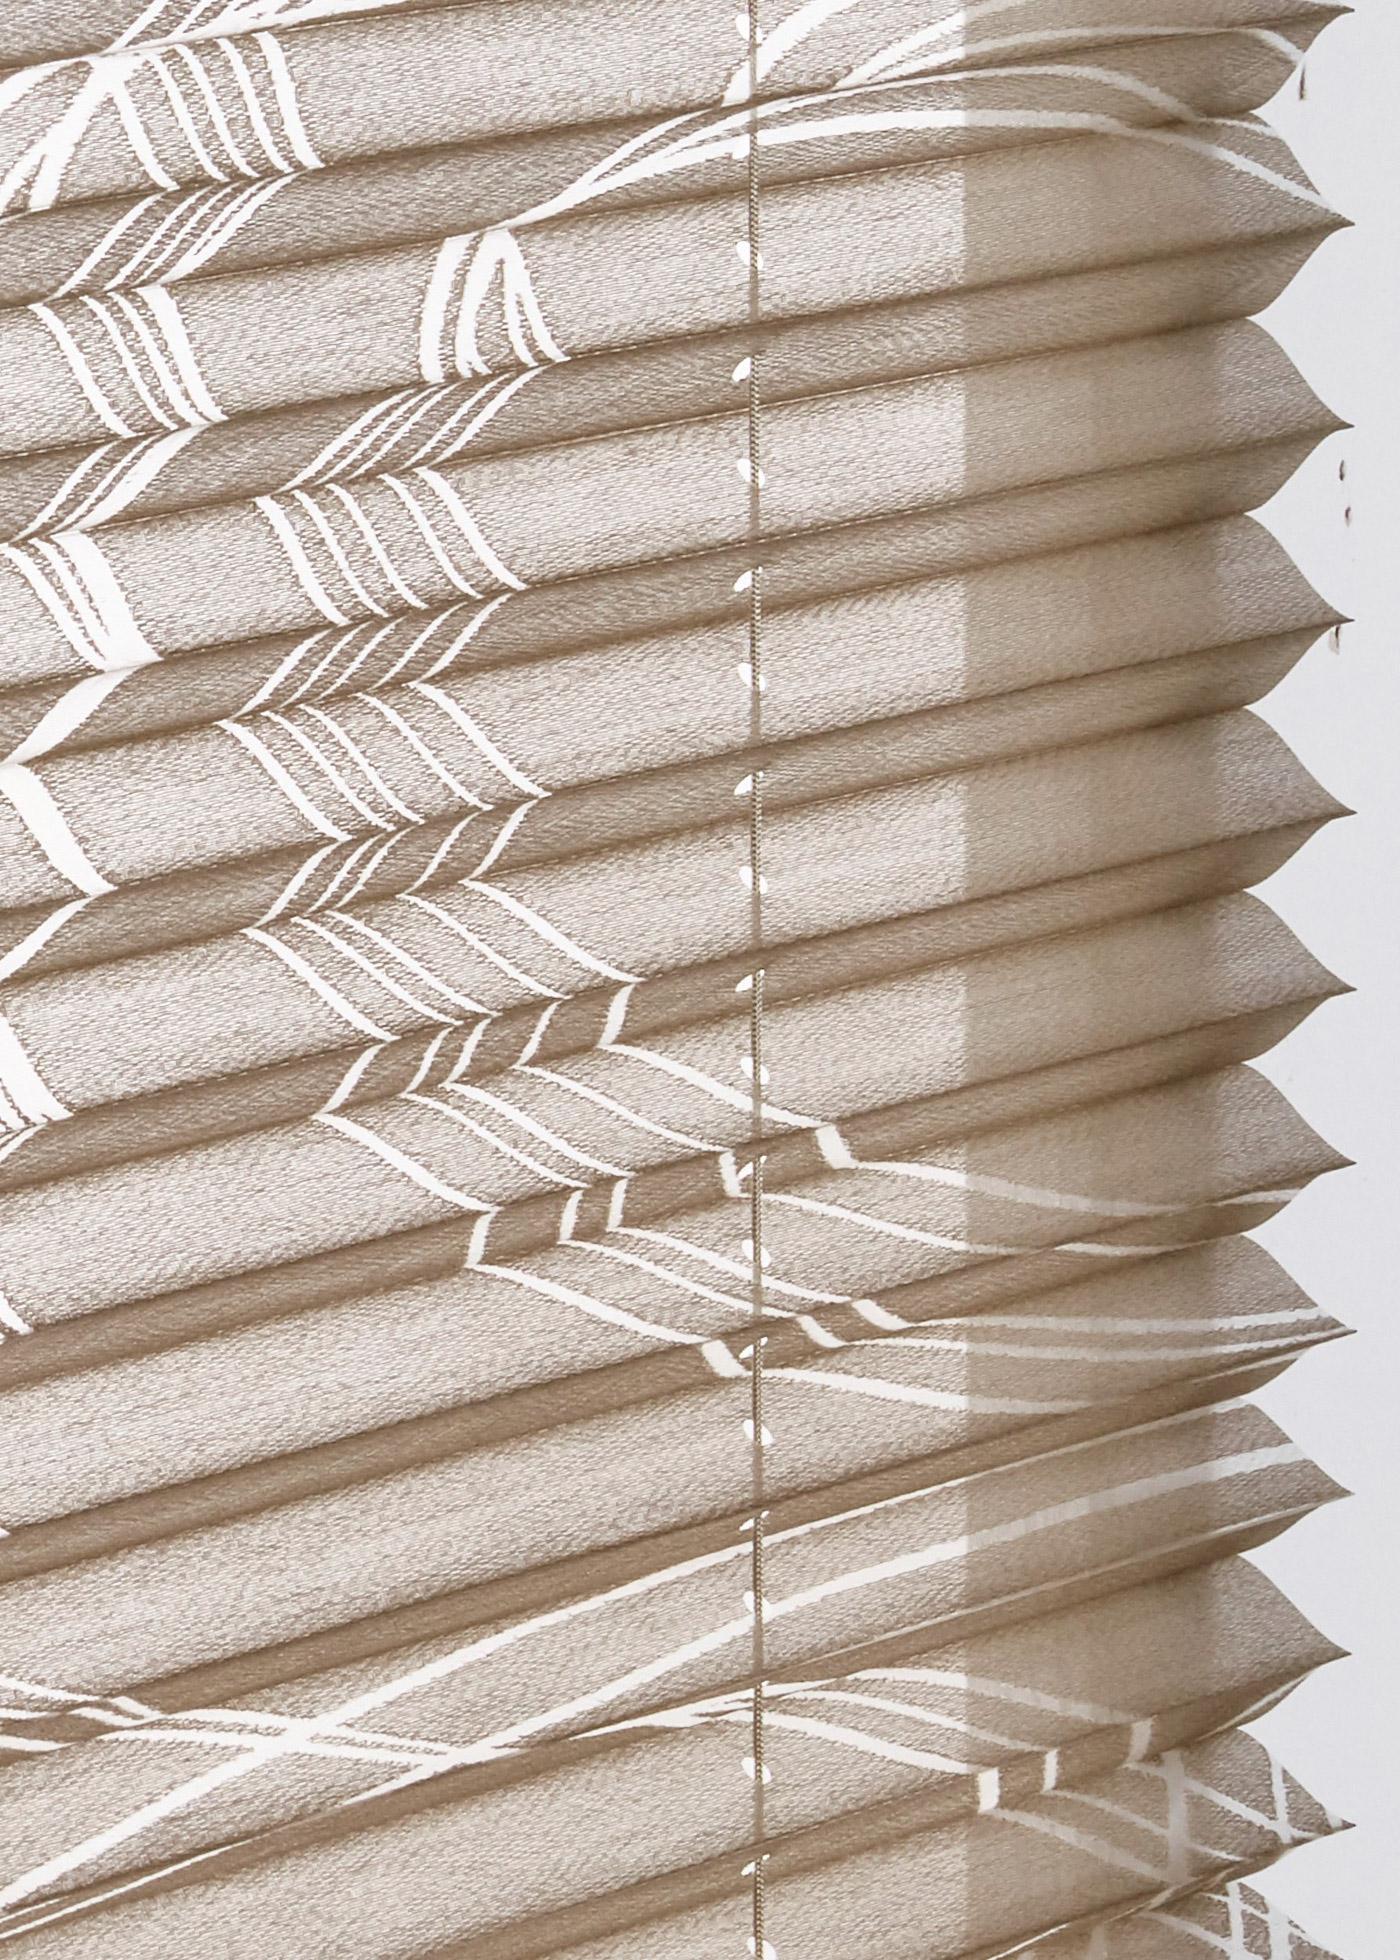 Ausbrenner plisségordijn met patroon